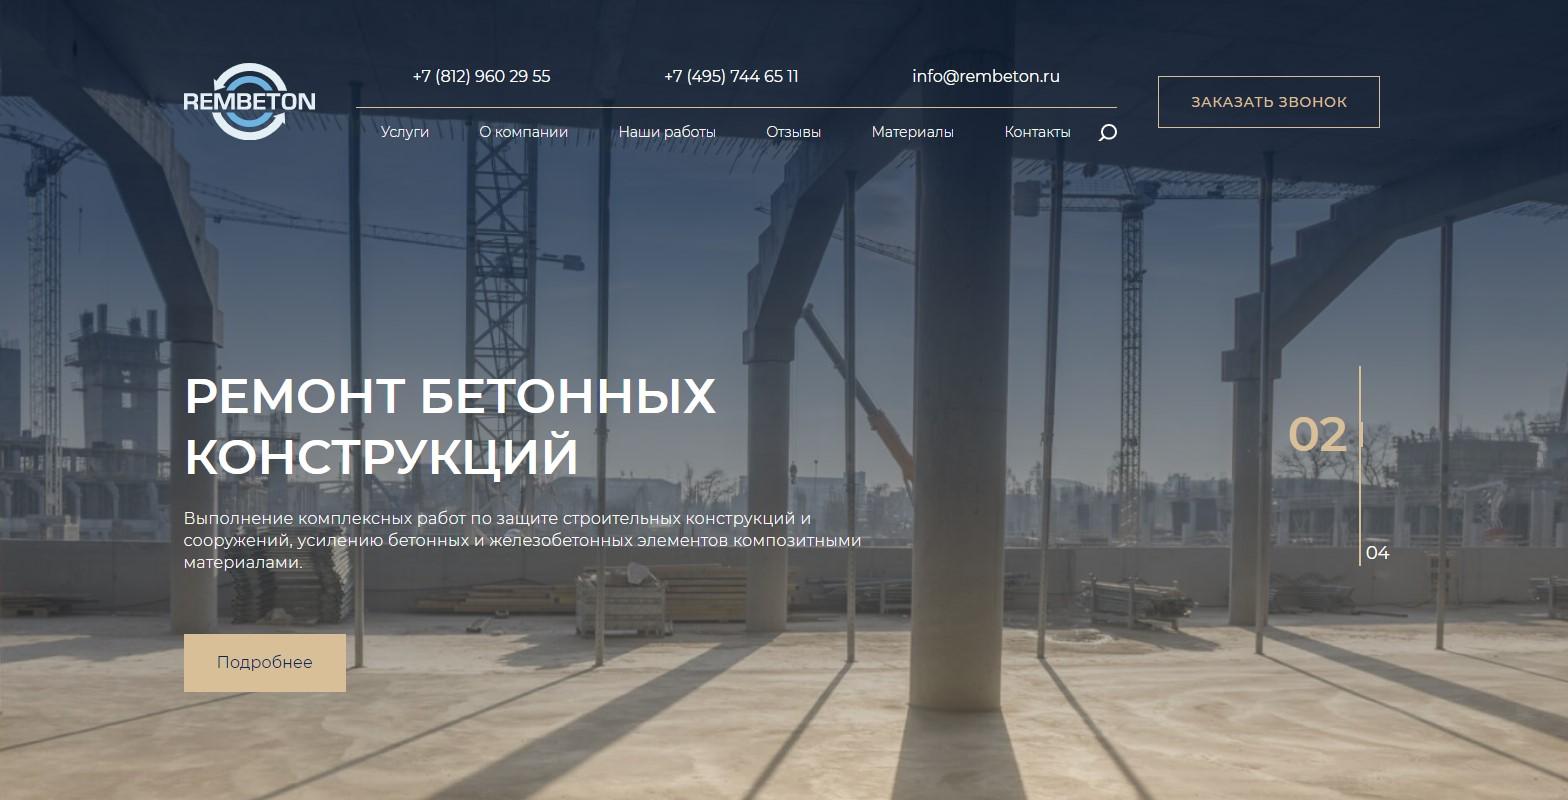 rembeton.ru